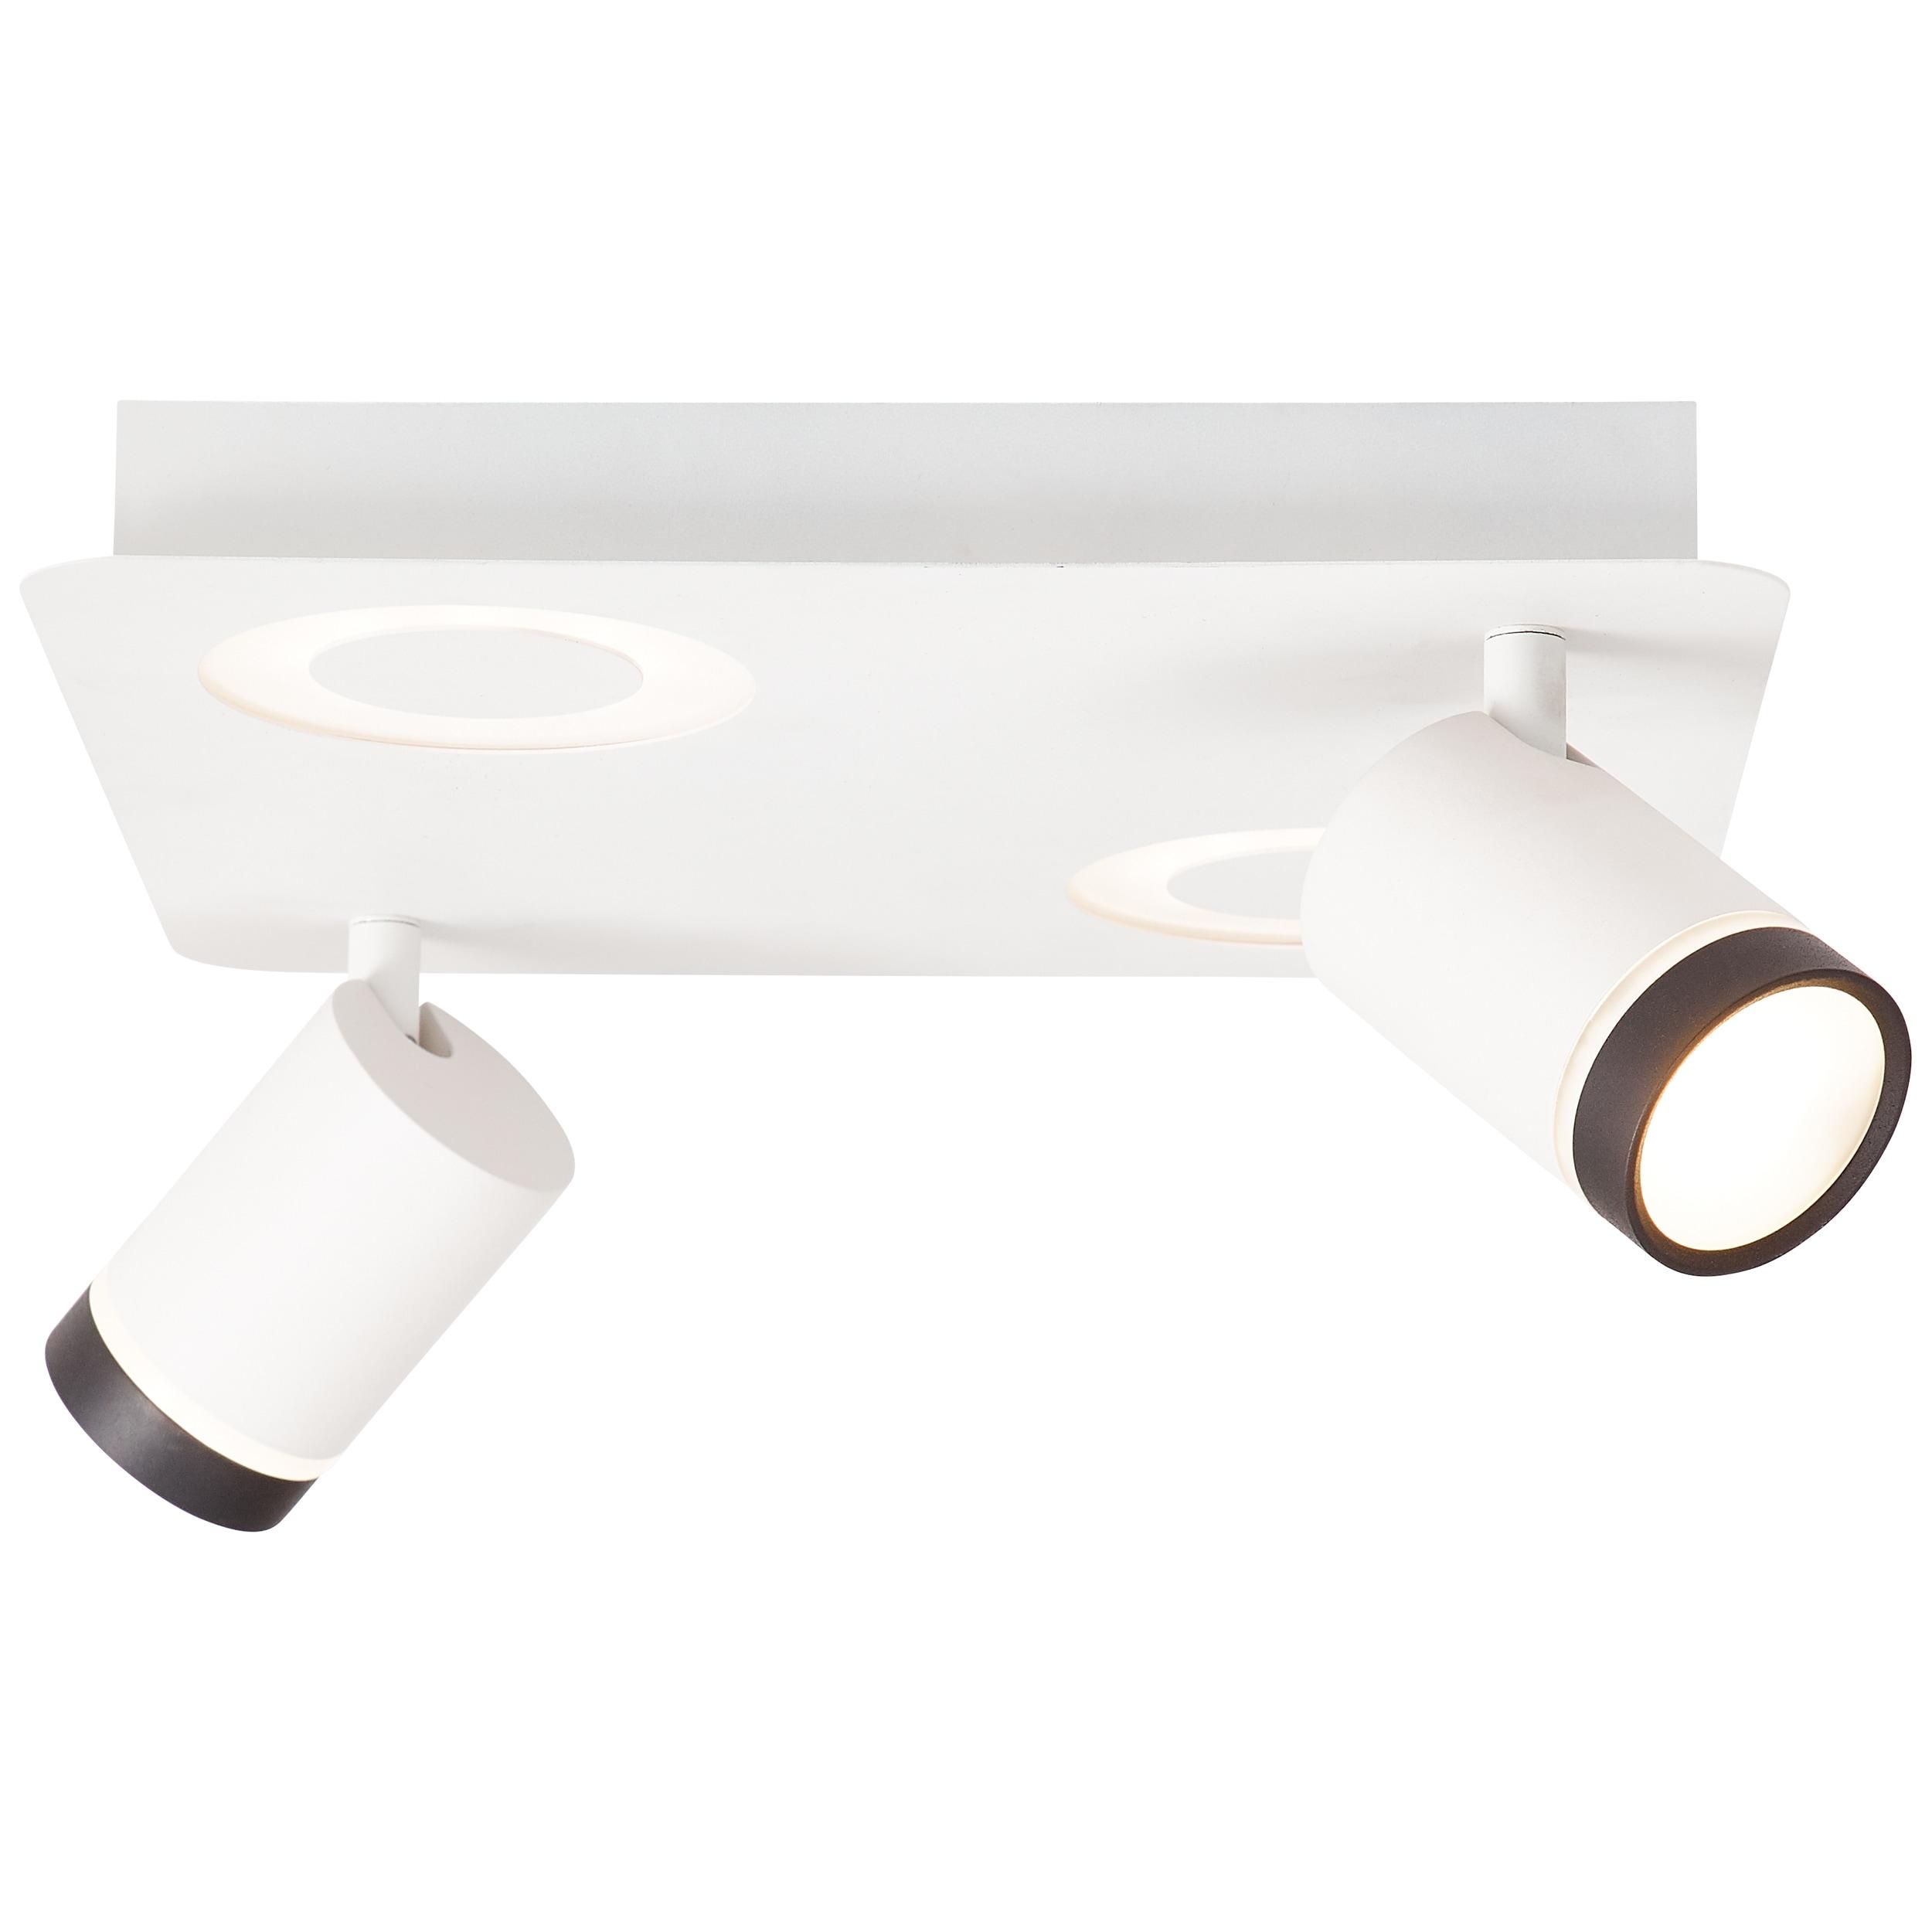 AEG Breena LED Spotplatte 4flg sand weiß/schwarz